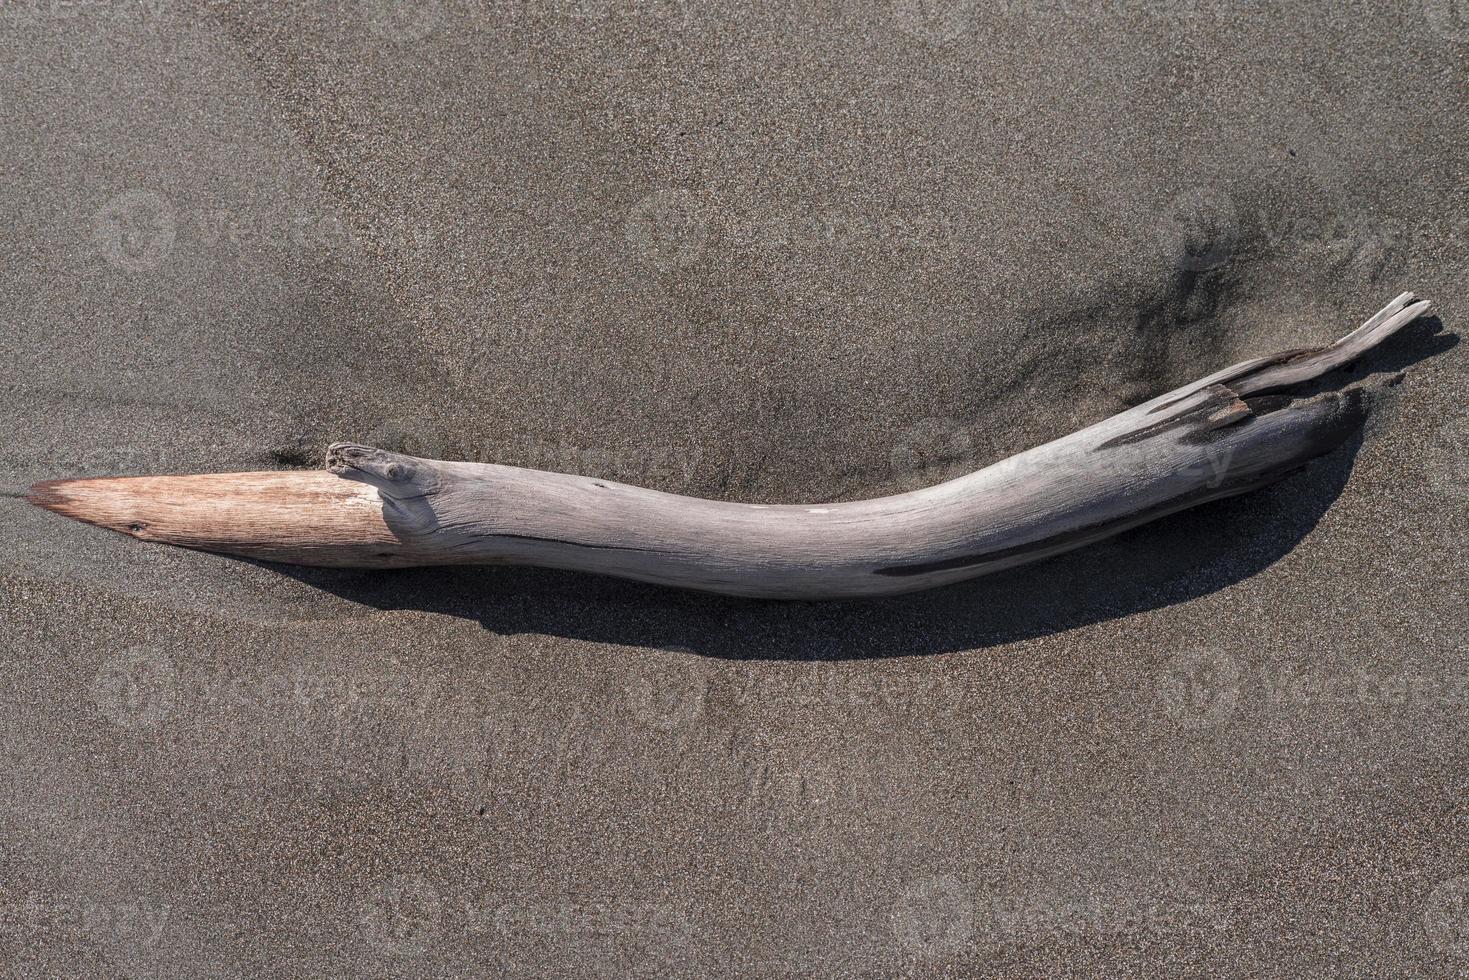 Driftwood Close Up photo